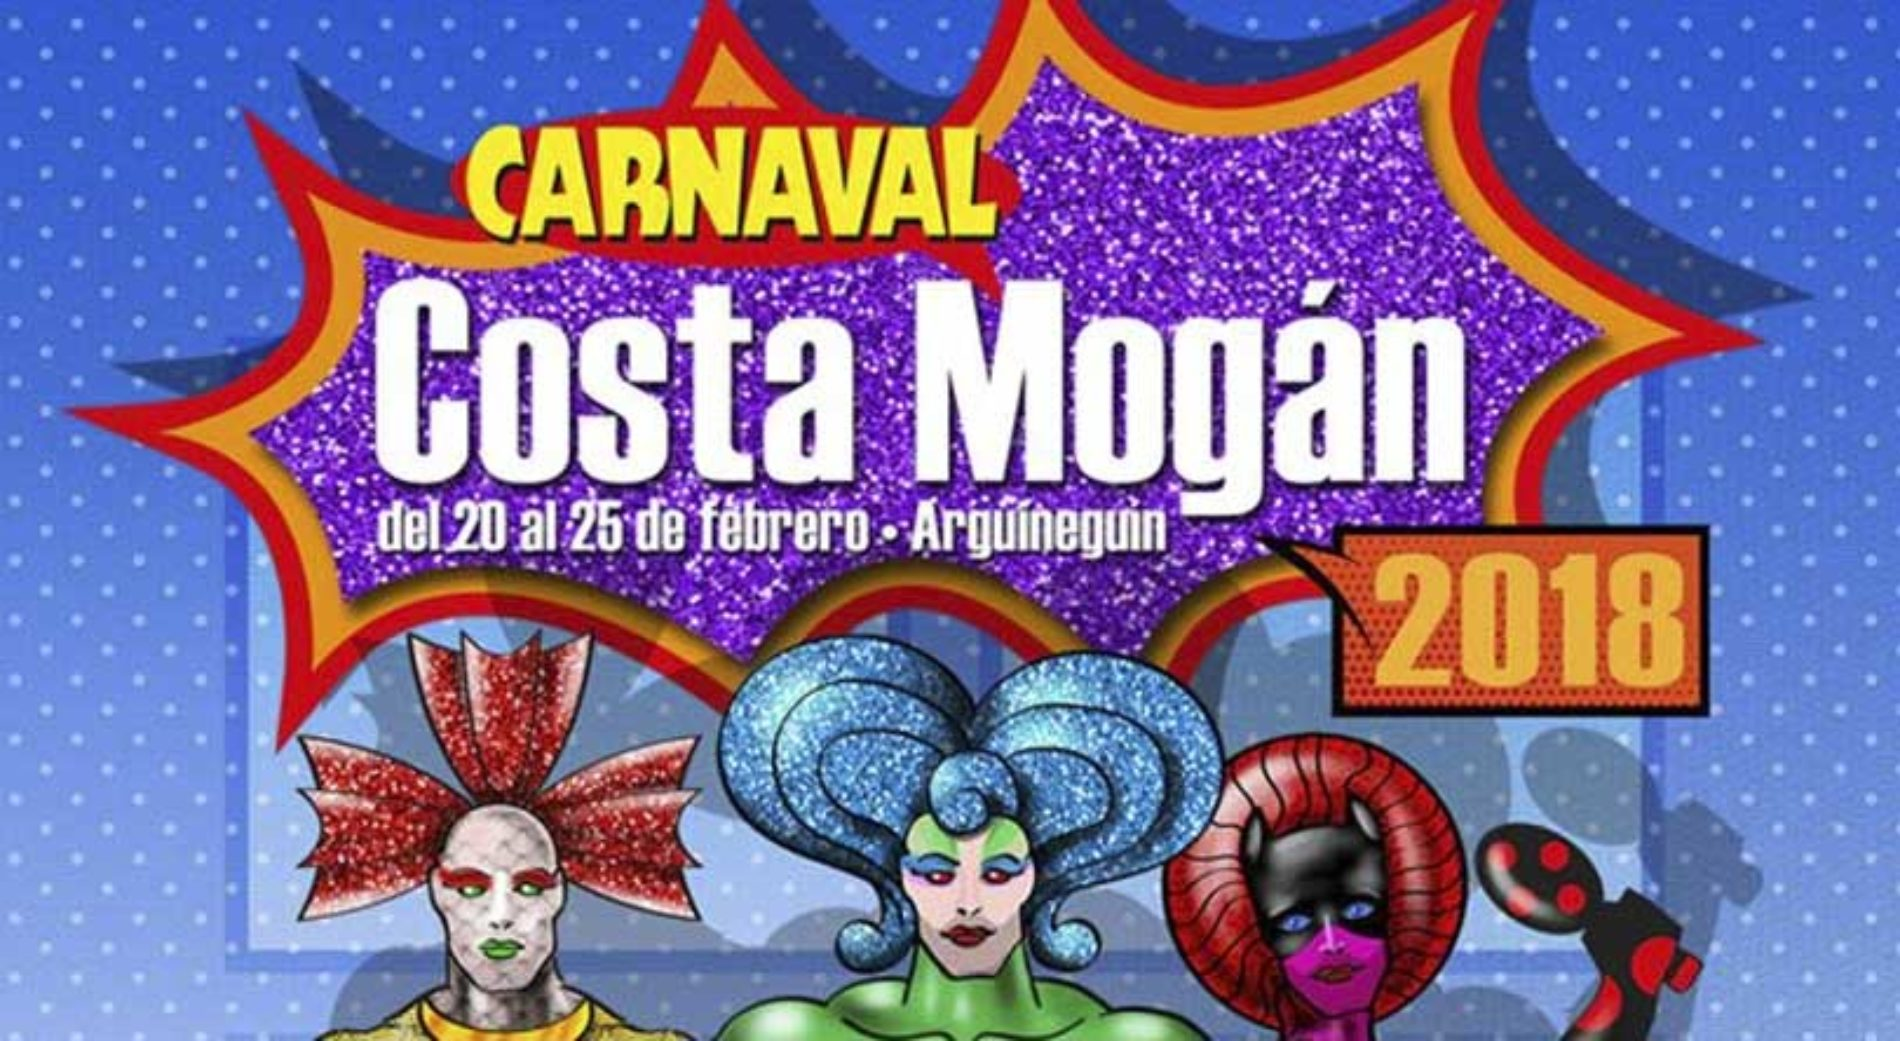 Morsomme karnevalsdager i Mogán i vente!